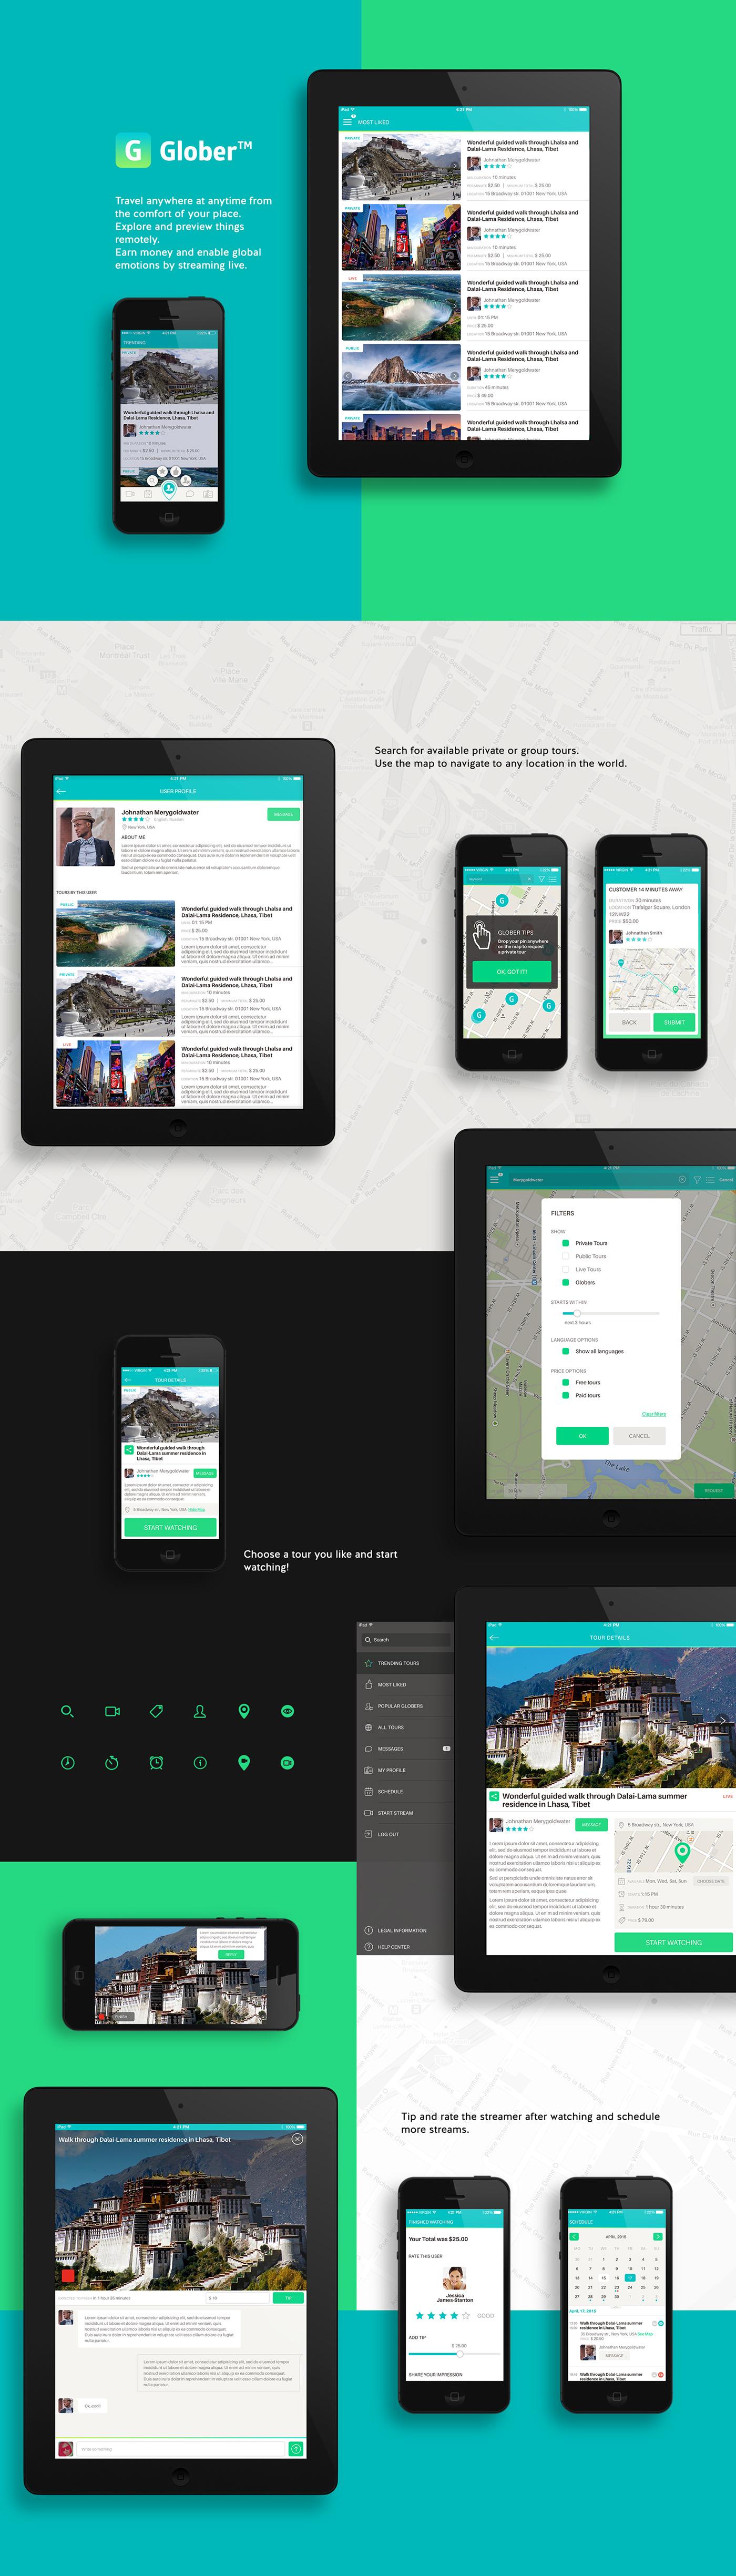 galitsky galitskydesign application app Travelling video Streaming design user expirience UI/UX